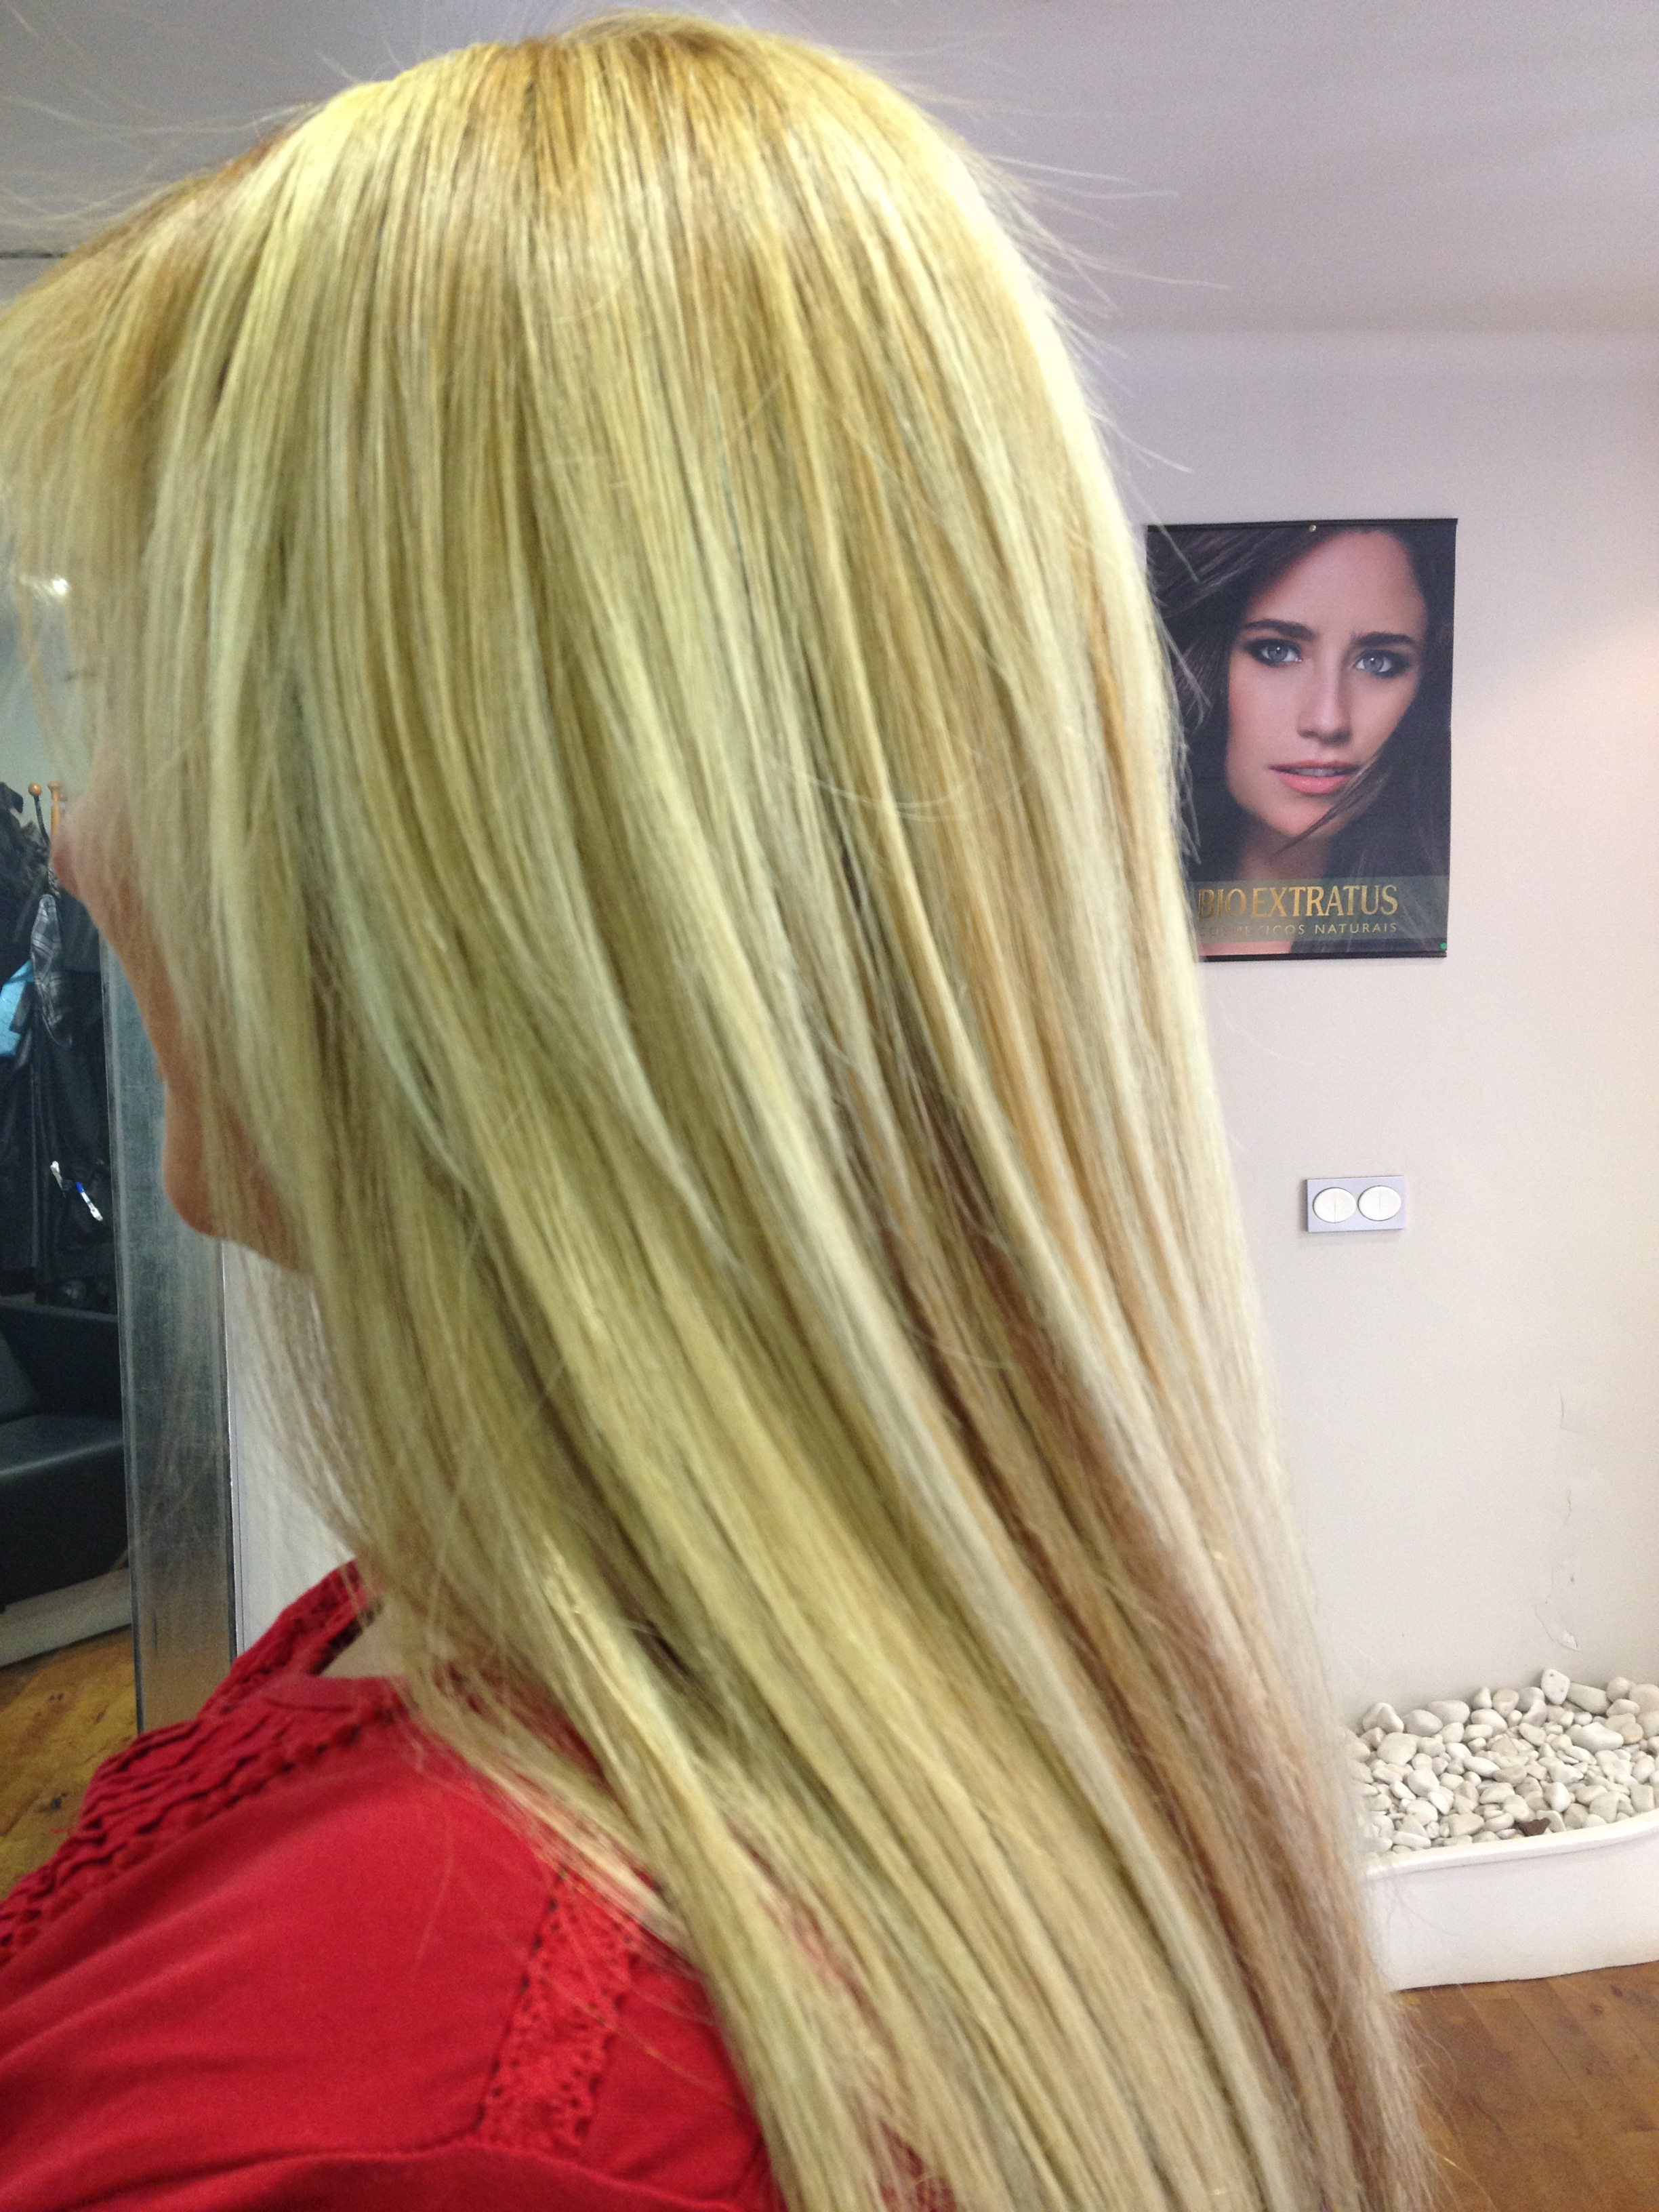 extensiones de keratina rubio claro rubio loiro